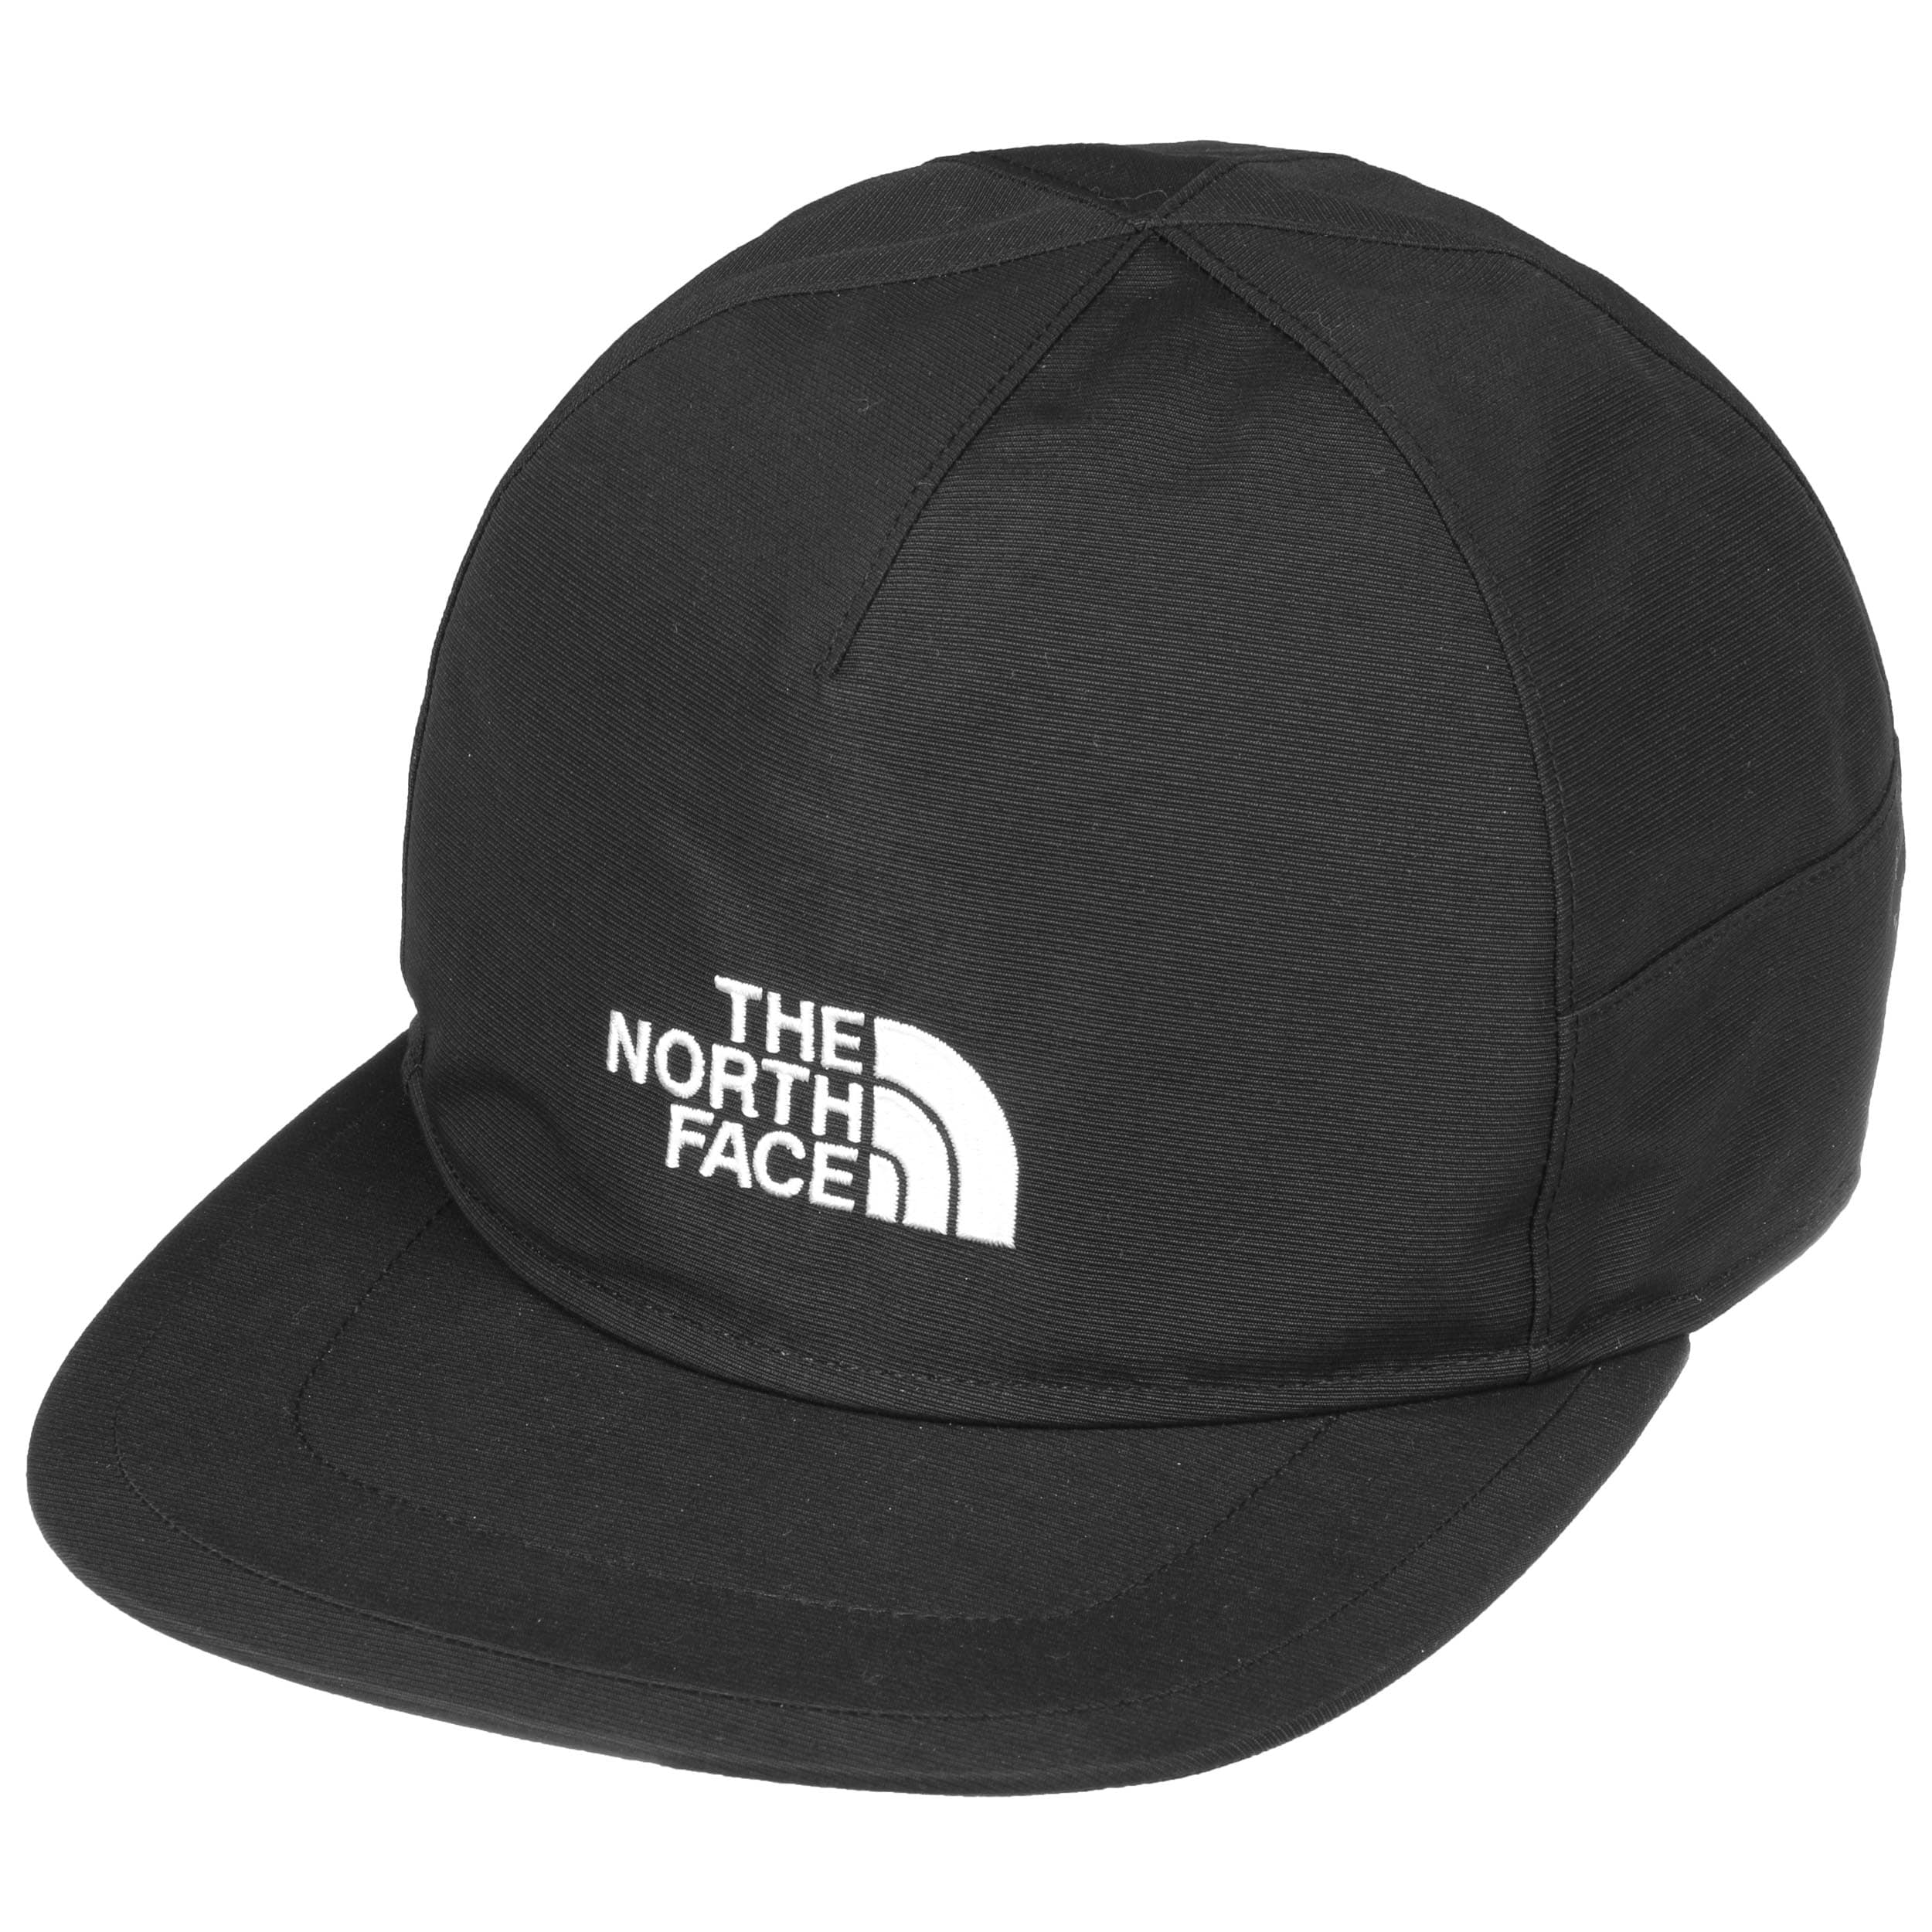 b9e2effee5b ... Gore-Tex Mountain Cap by The North Face - black 1 ...